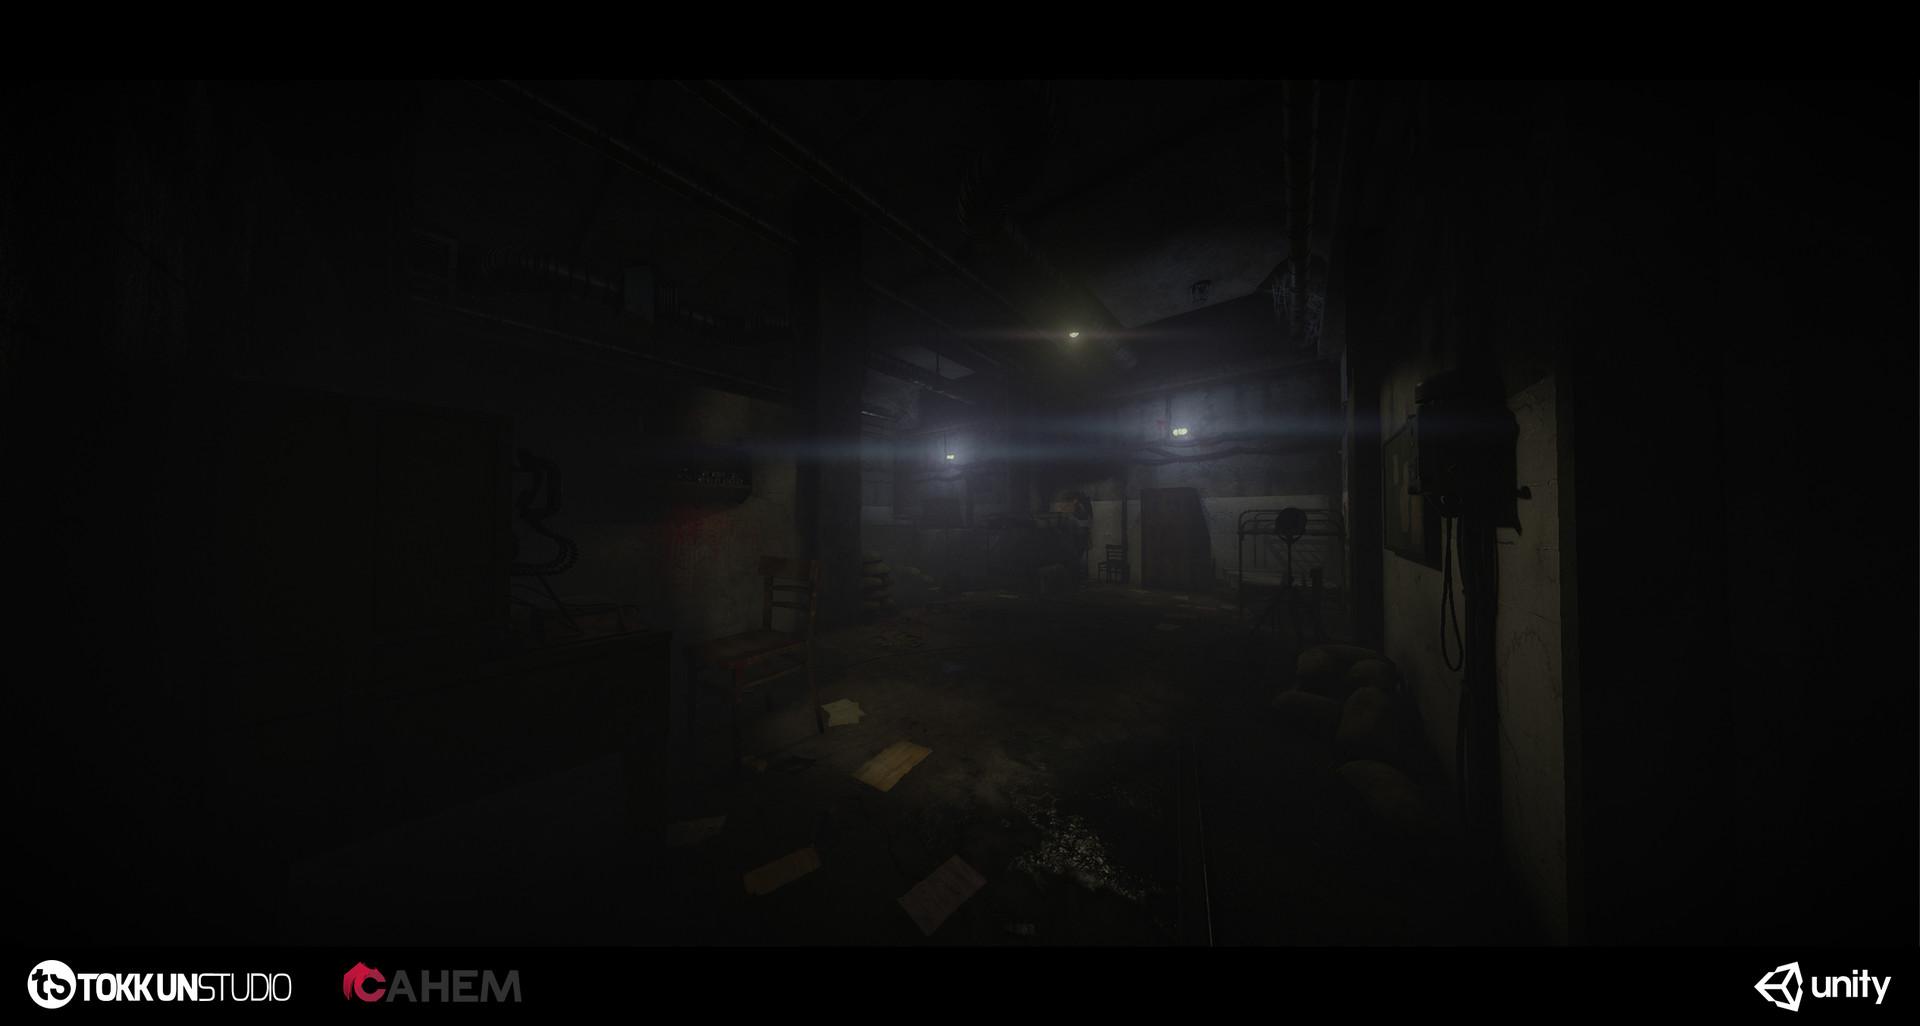 Tokkun studio bunker shot 07